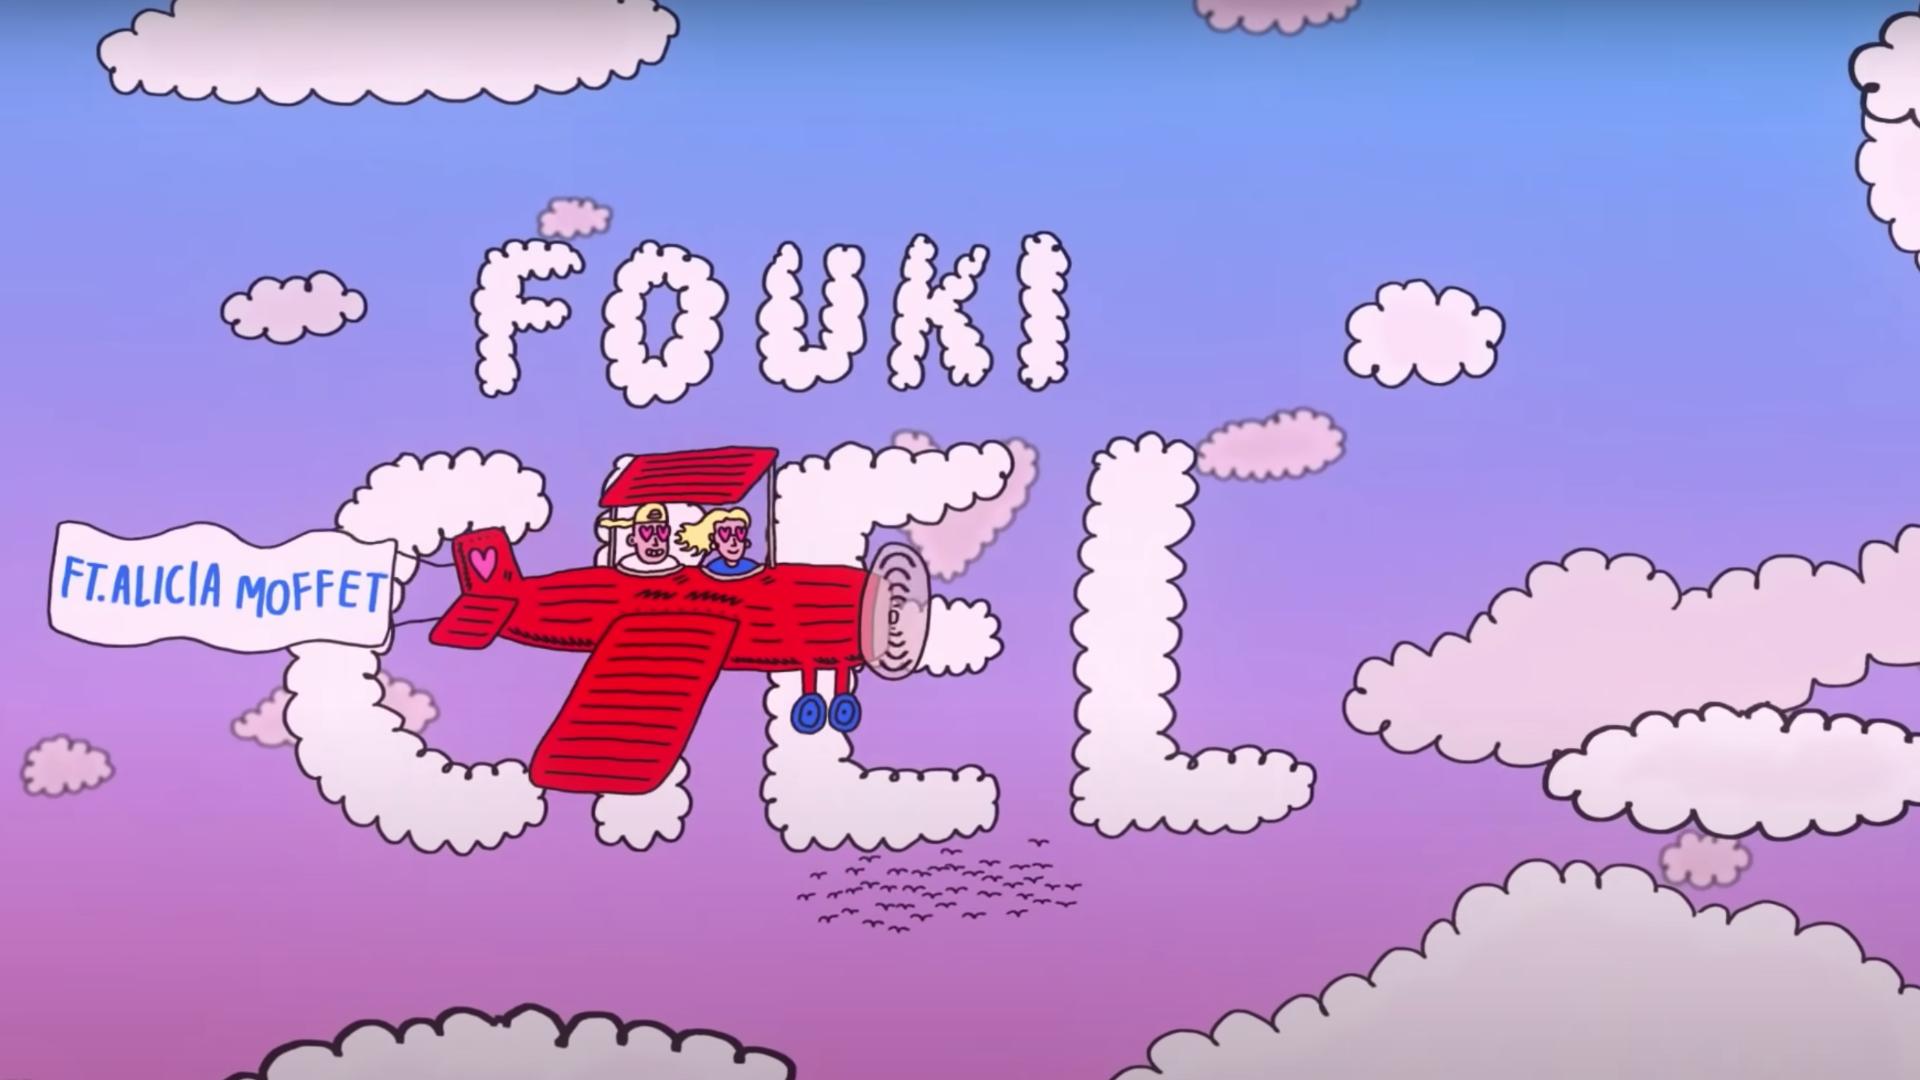 foukiFouKi - Ciel (feat. Alicia Moffet)